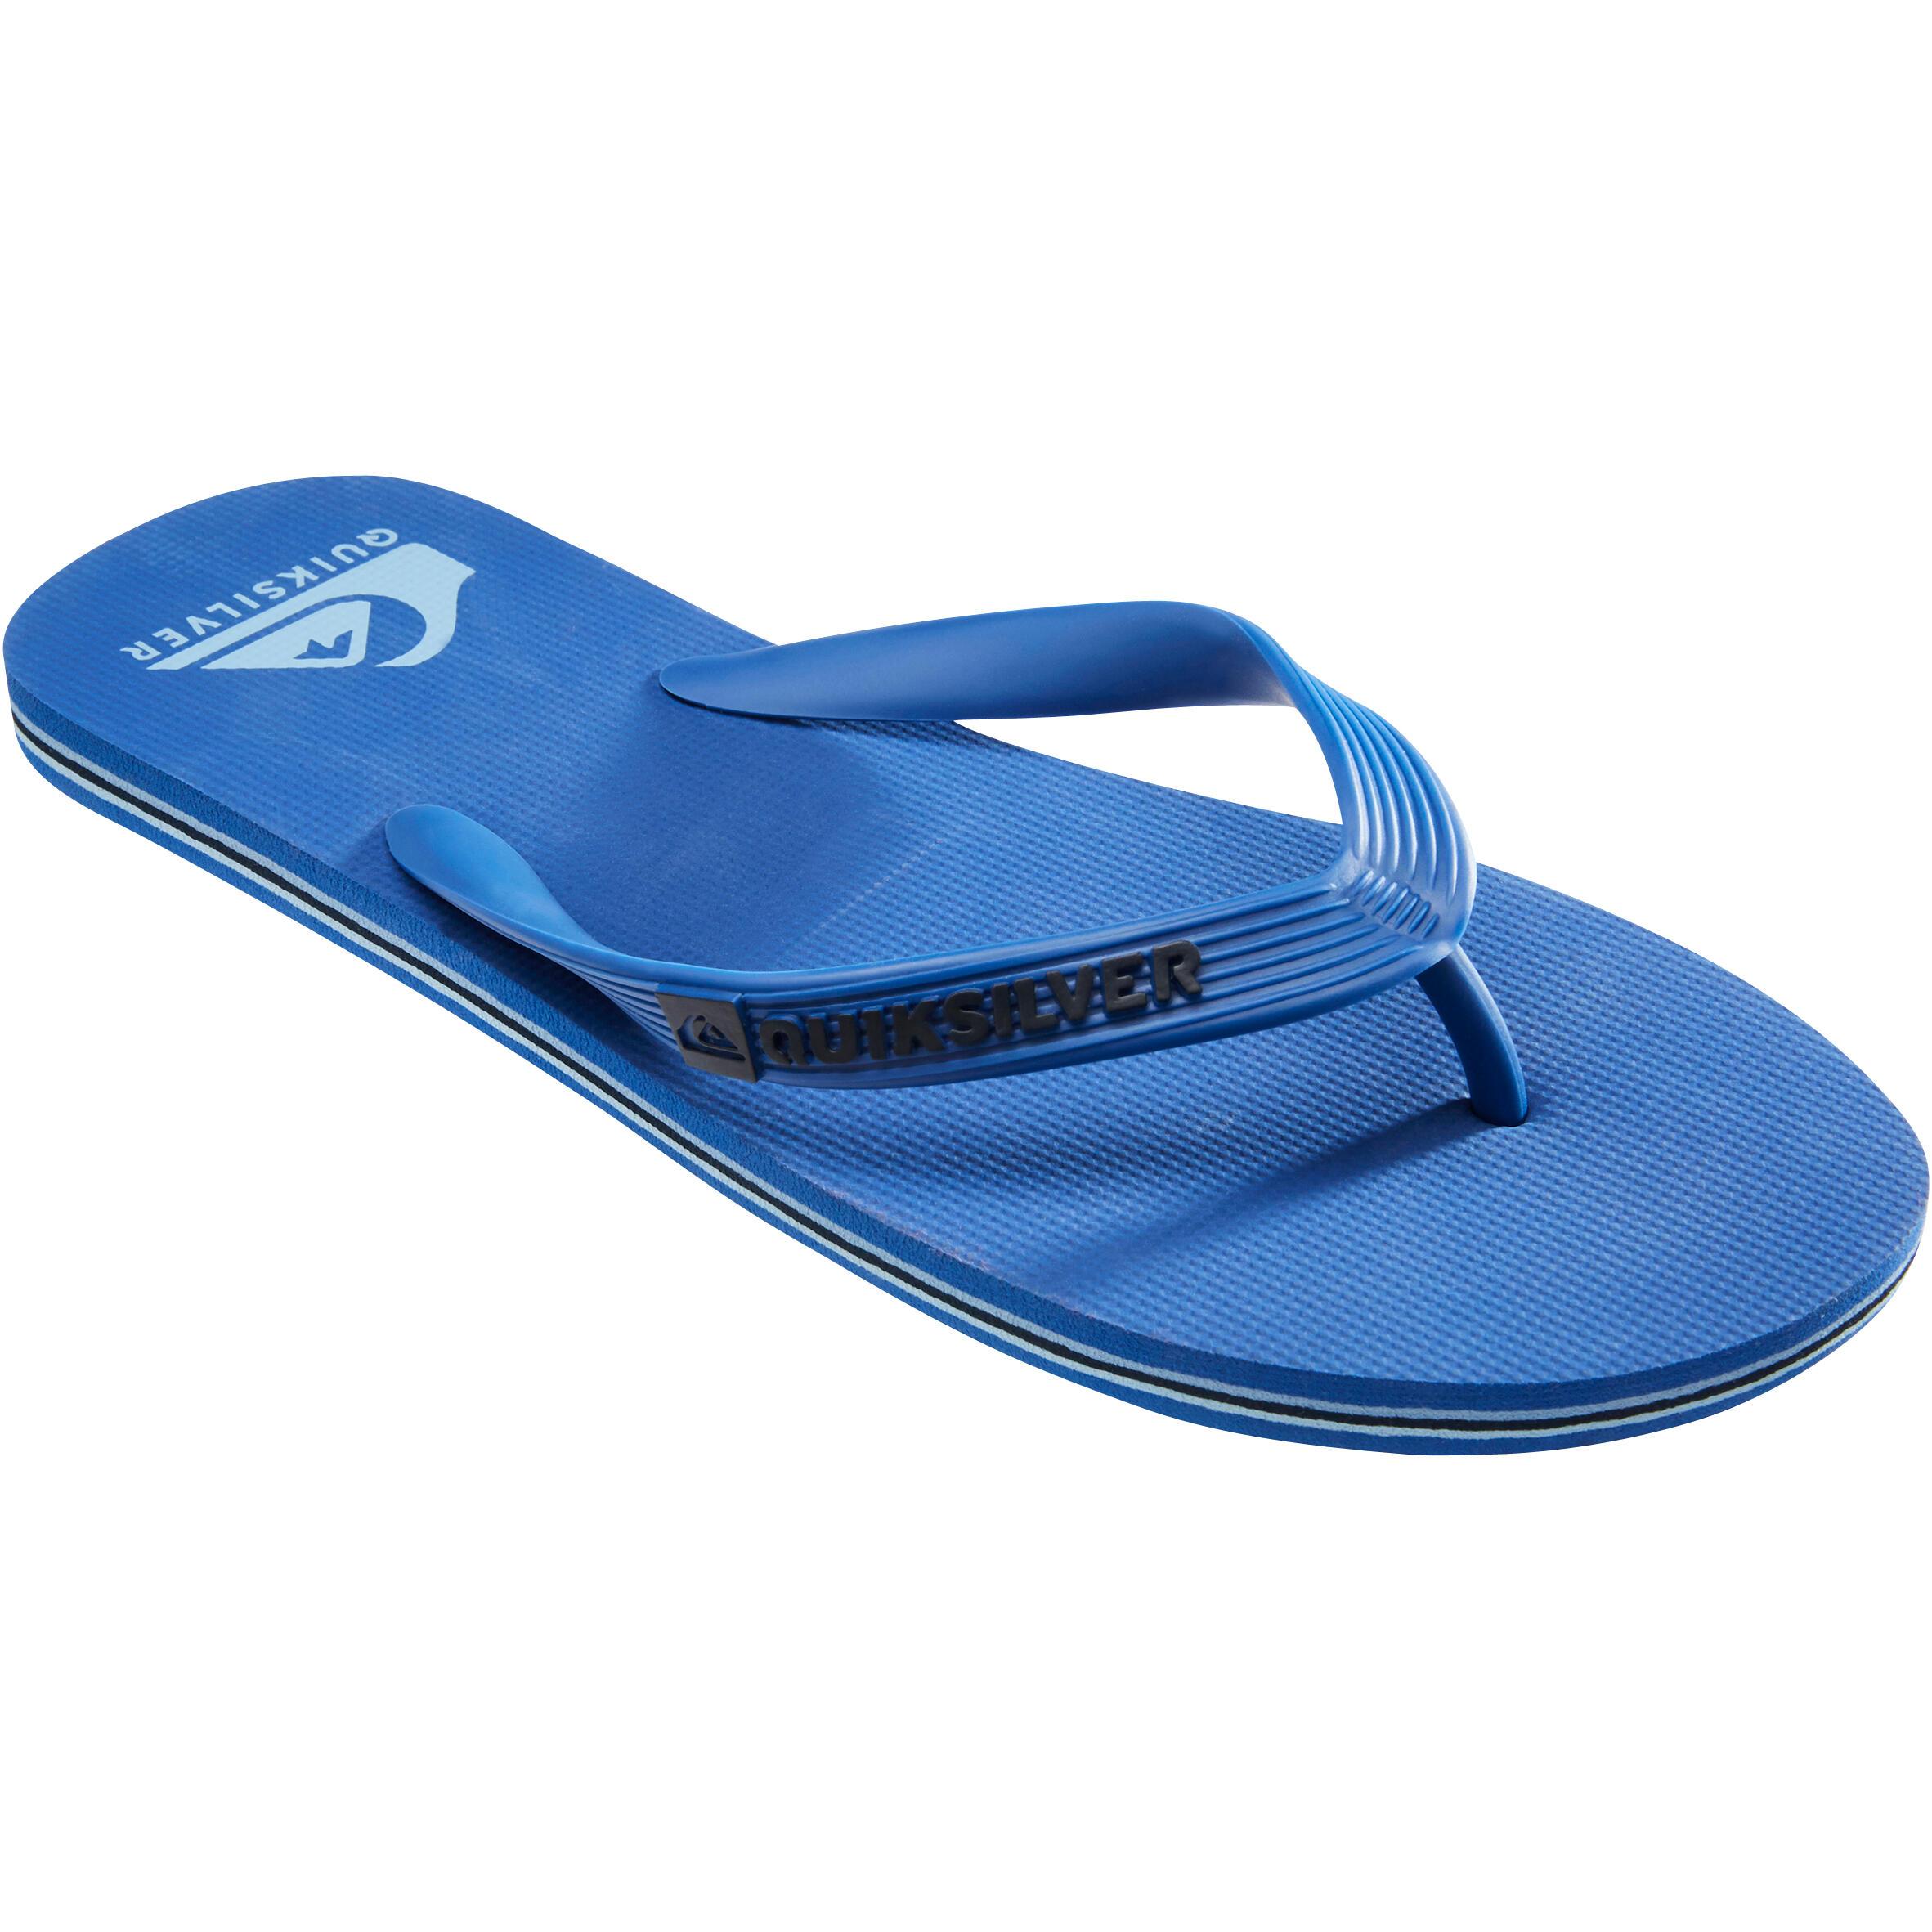 Zehensandalen Molokai Wave Herren blau | Schuhe > Sandalen & Zehentrenner > Sandalen | Quiksilver